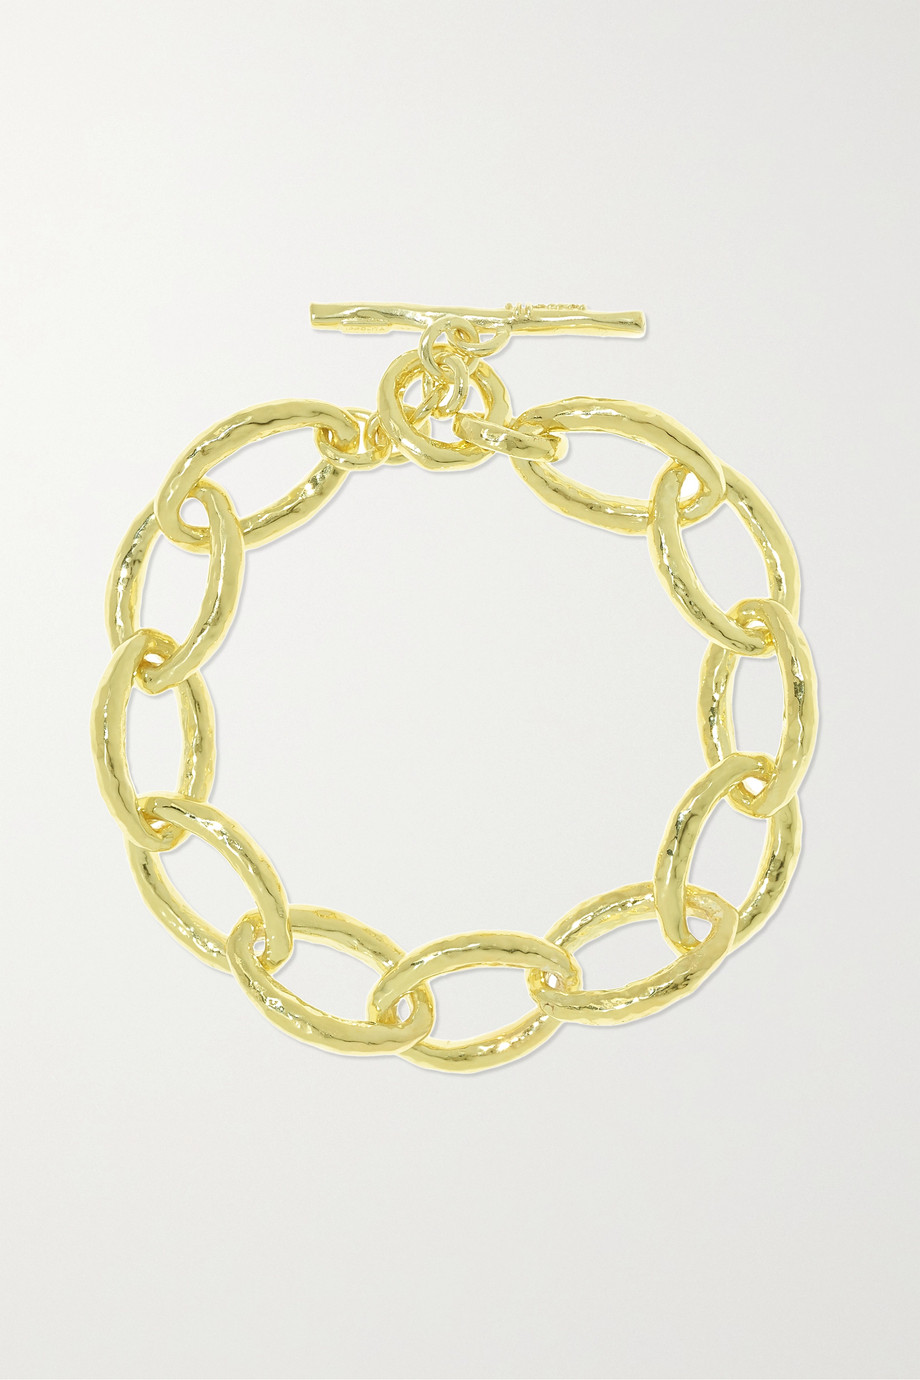 Ippolita Bracelet en or 18 carats Classico Bastille